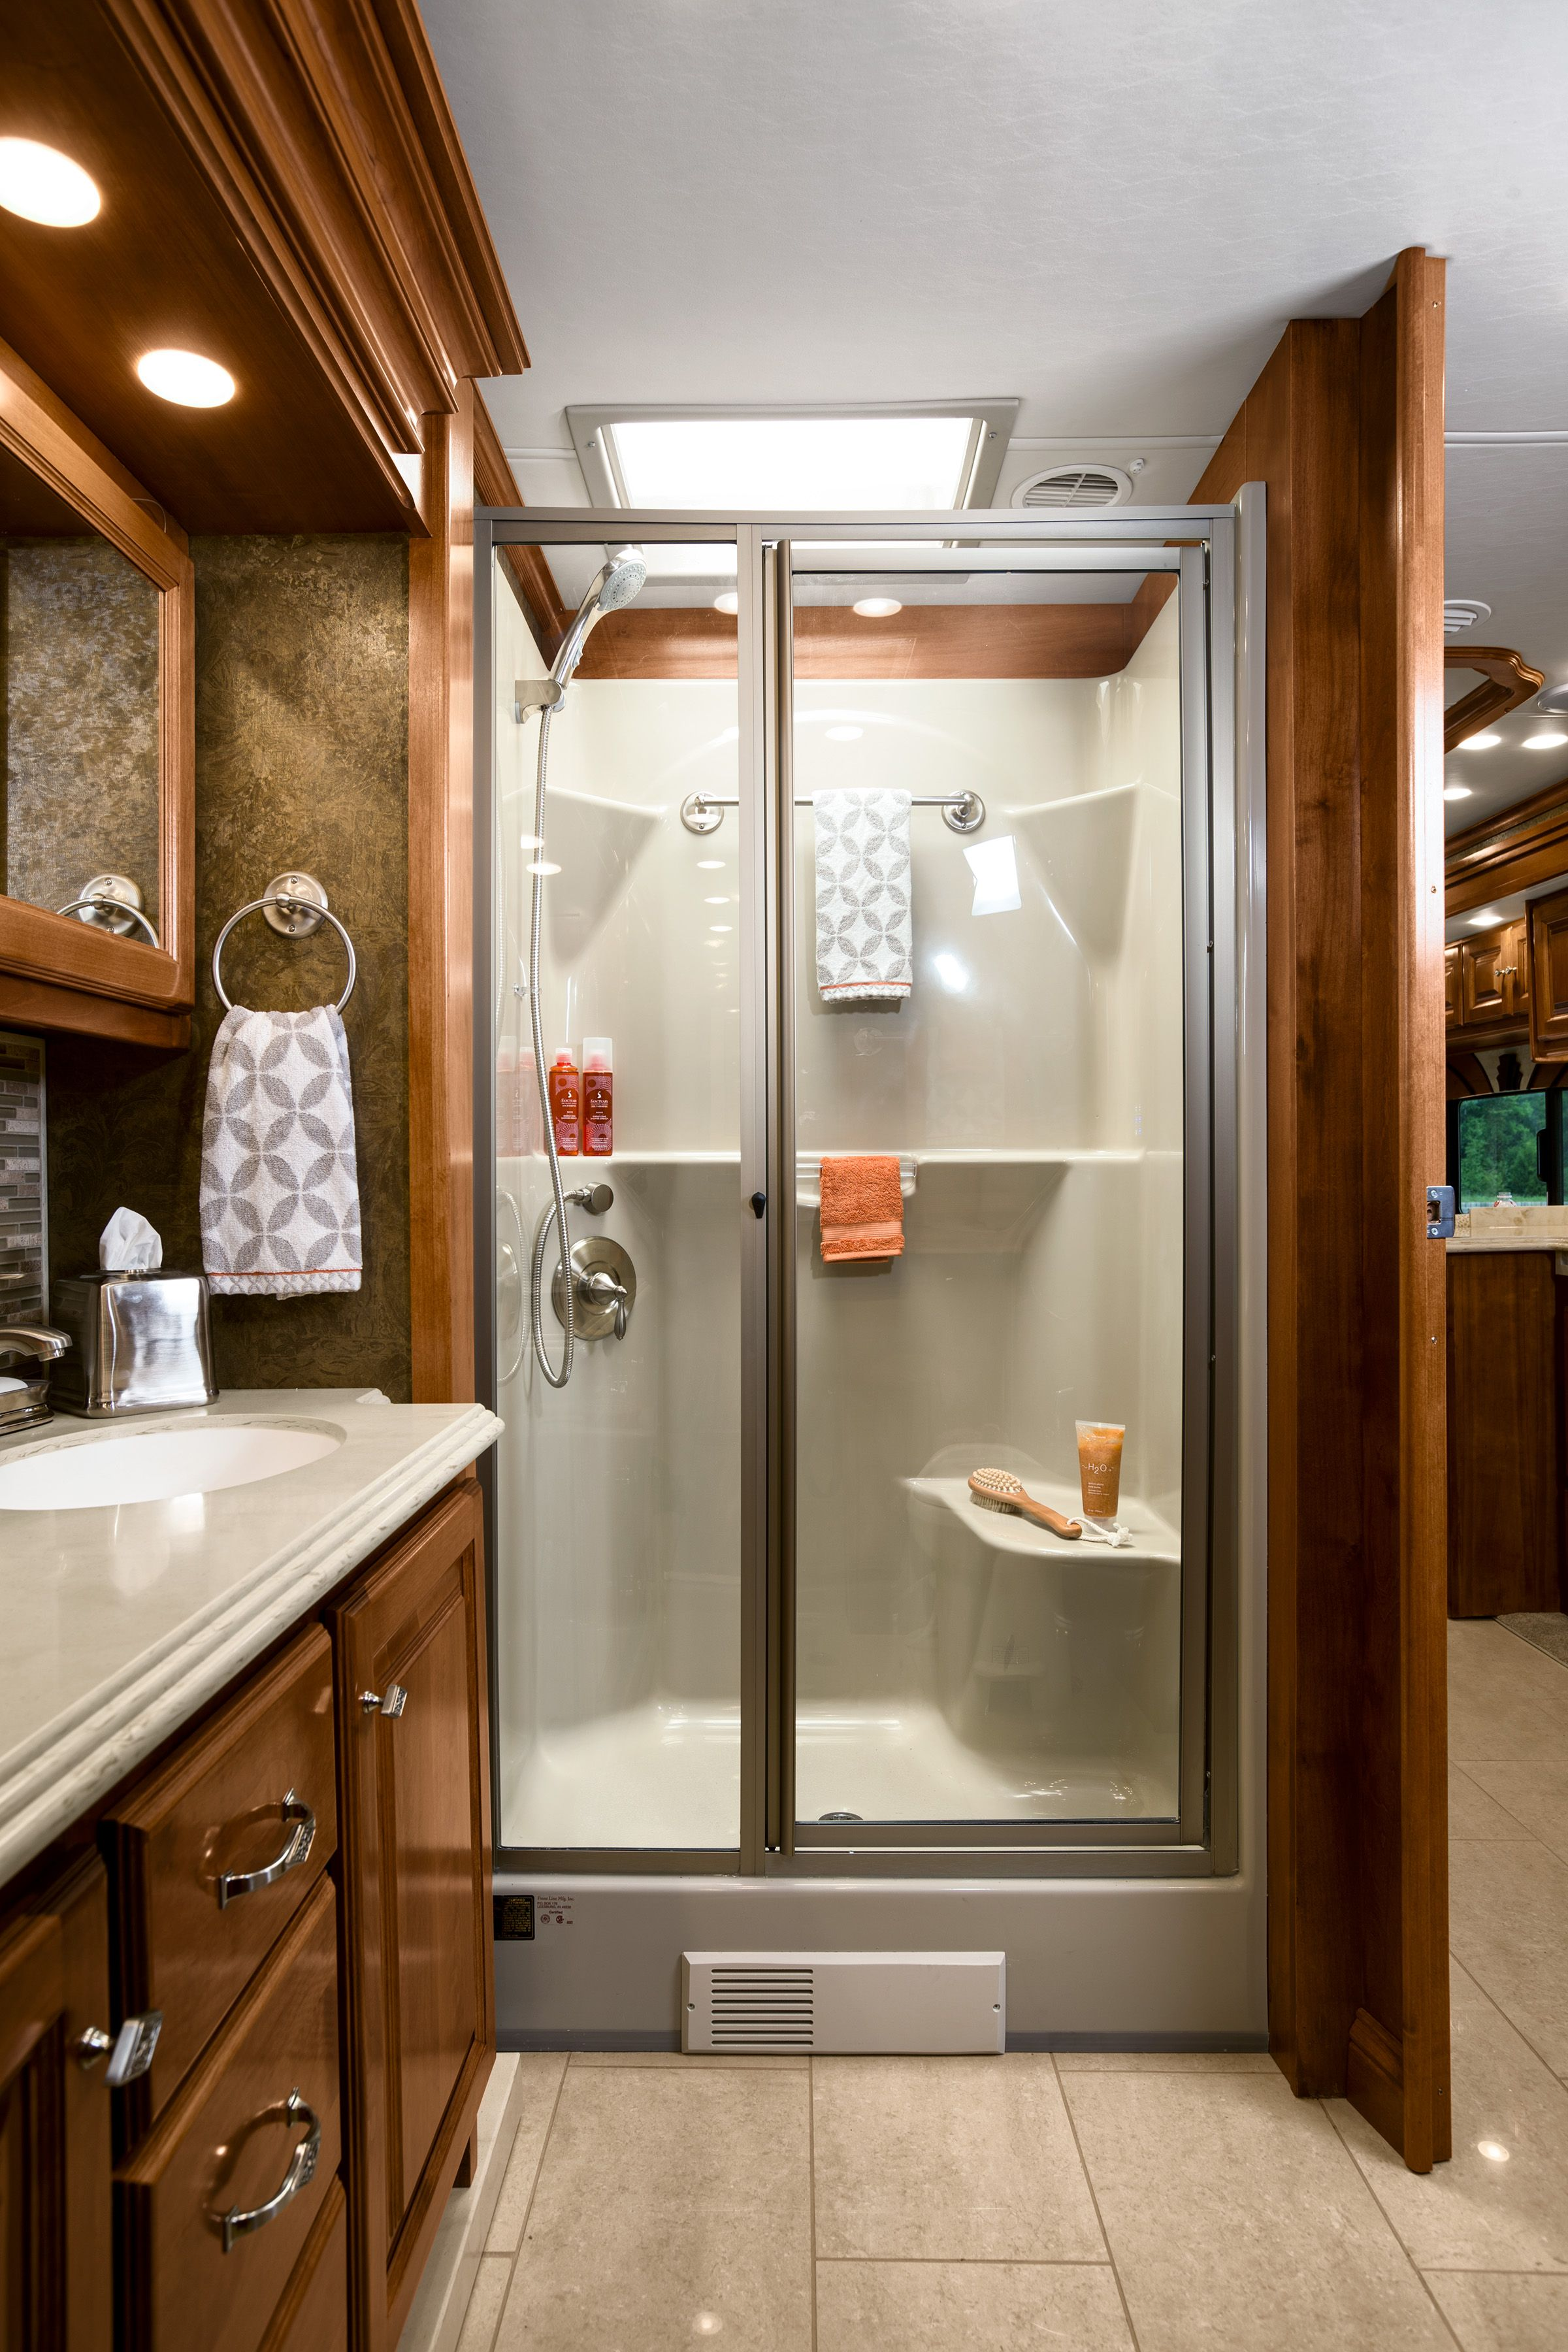 2015 Phaeton Bath Rv Homes Rv Dreams Container House